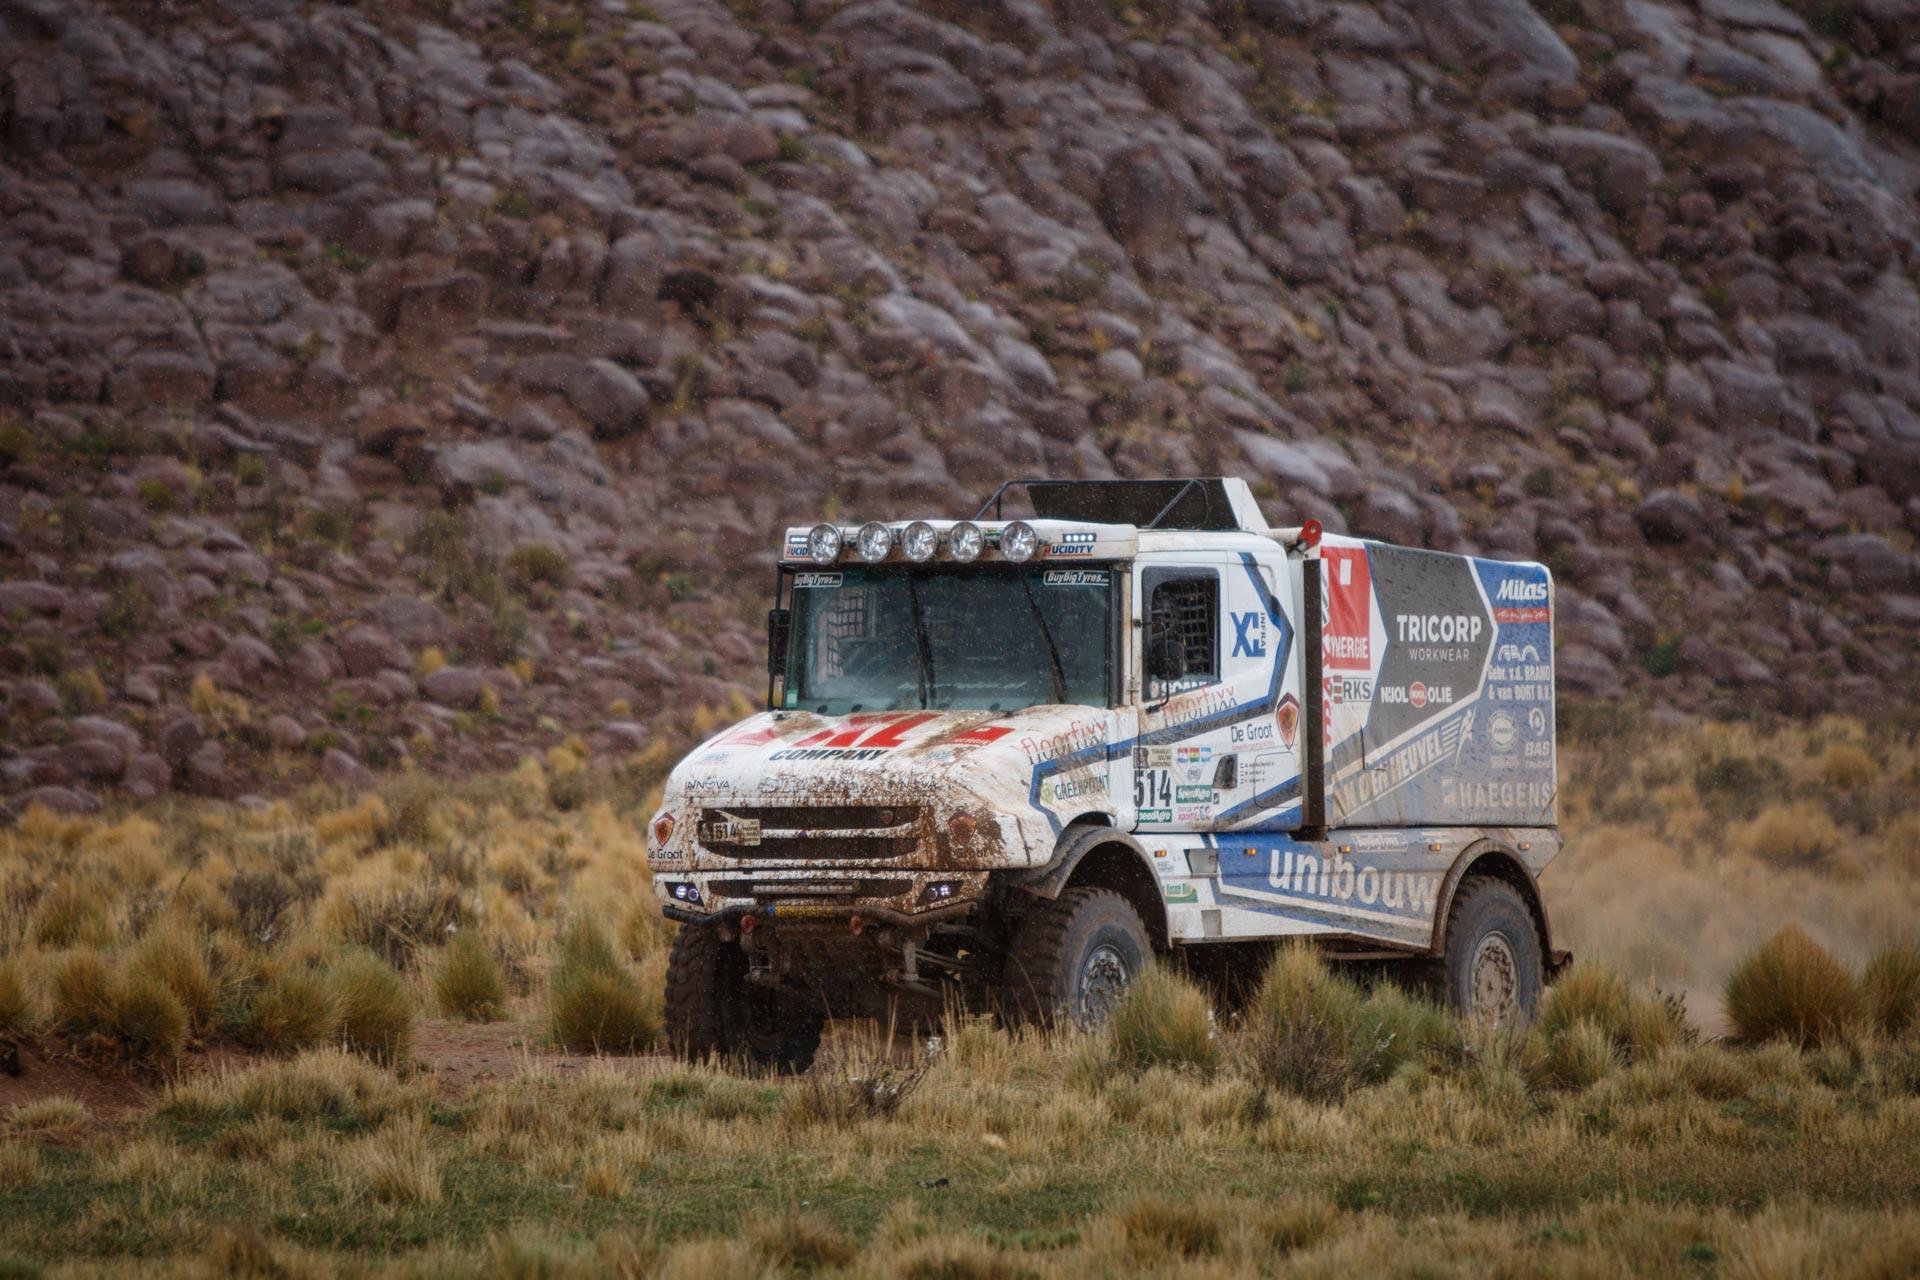 Dakarspeed: Etappe 10 Chilecito - San Juan